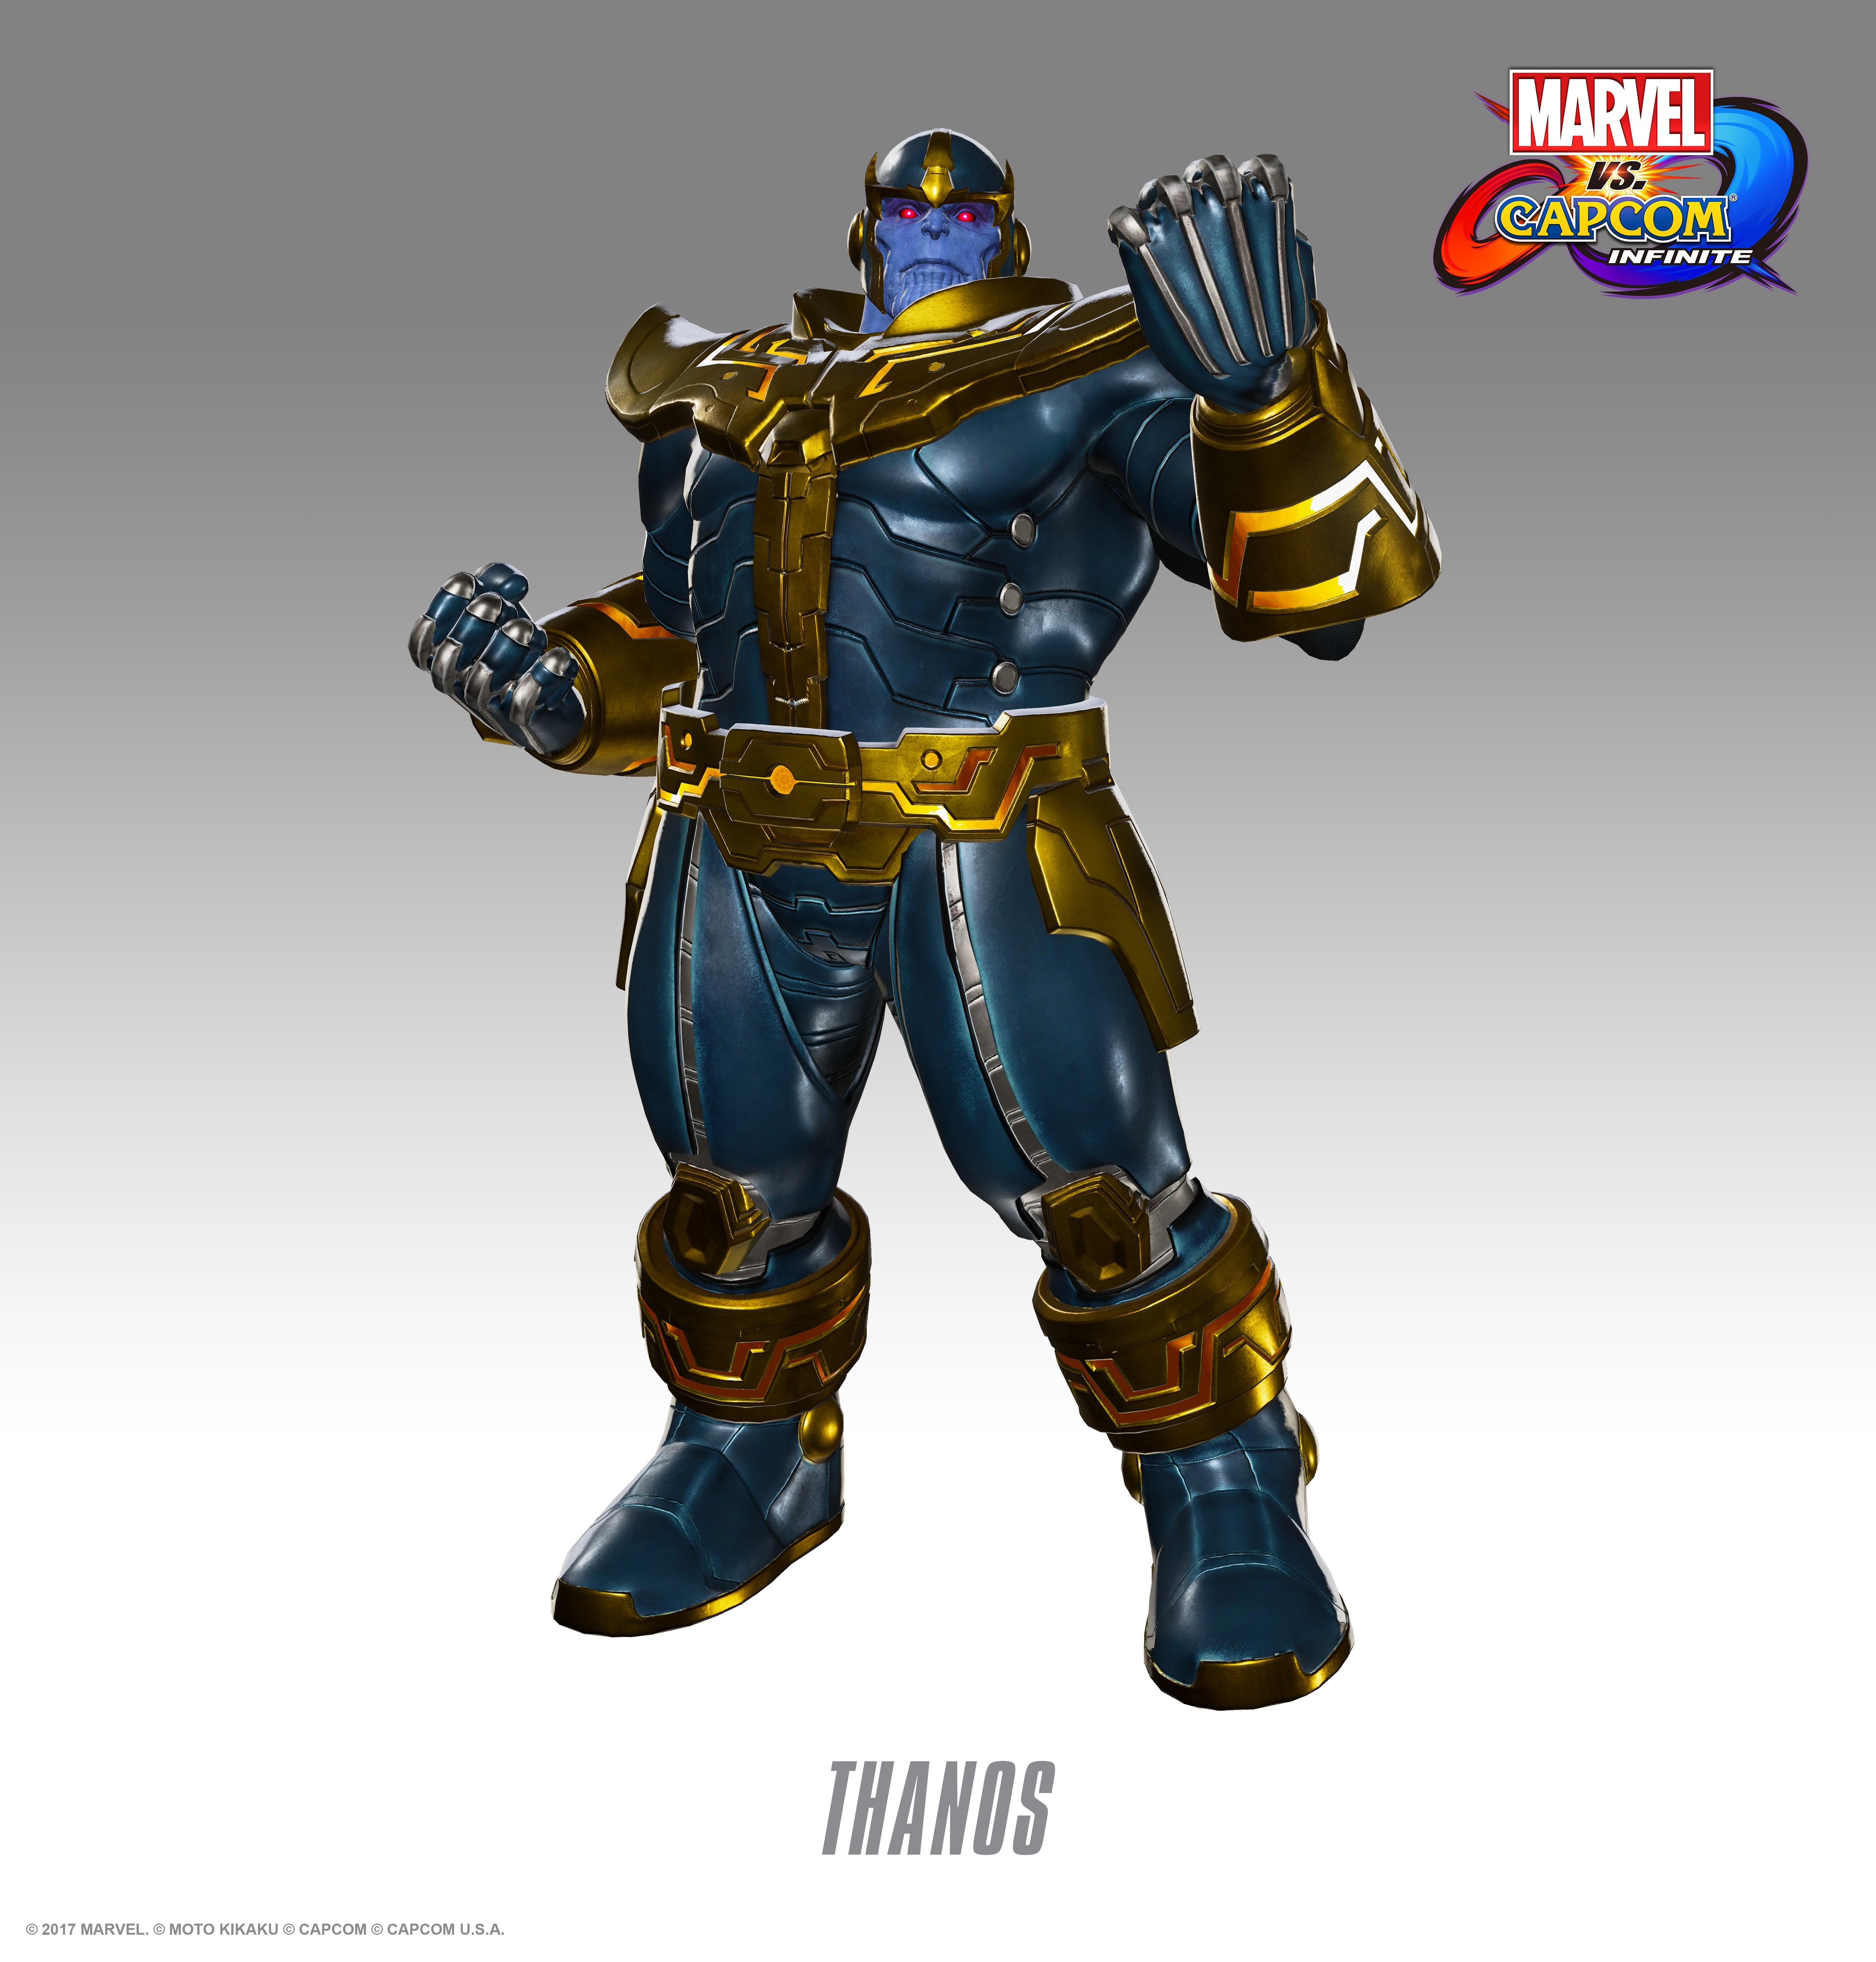 Танос - Marvel vs. Capcom: Infinite Арт, Персонаж